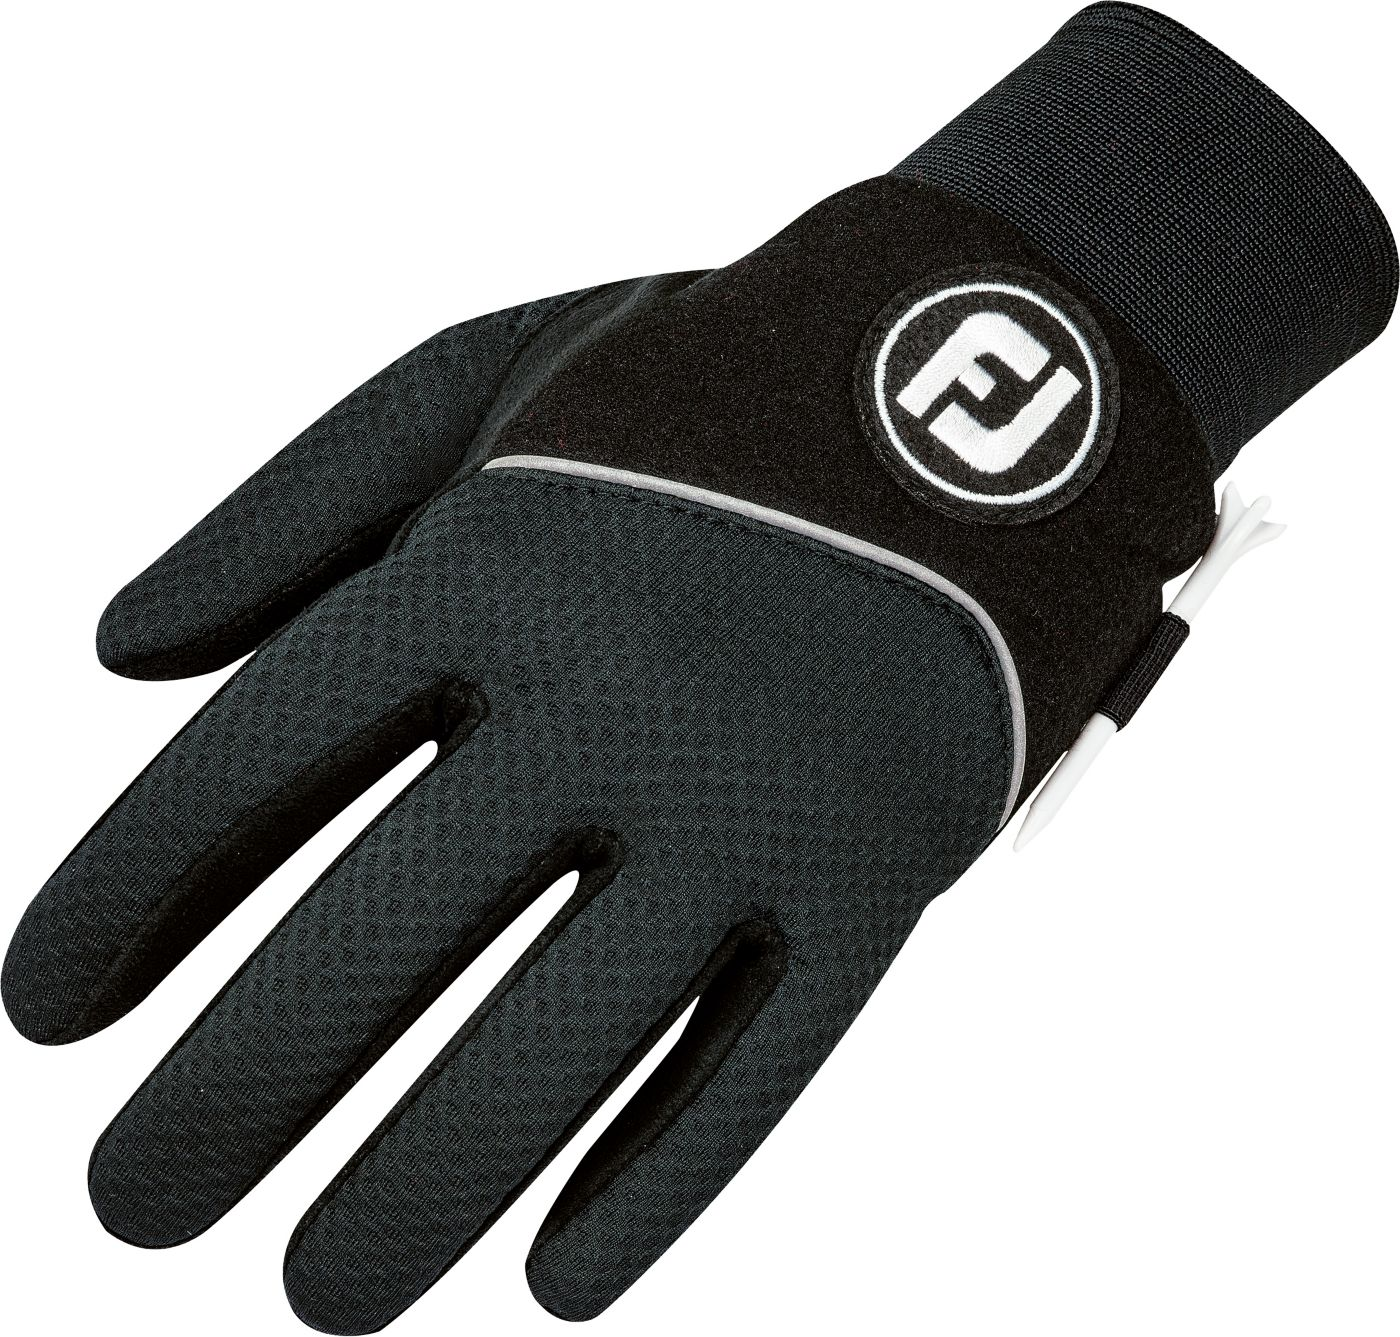 FootJoy Women's 2017 WinterSof Golf Gloves - Pair